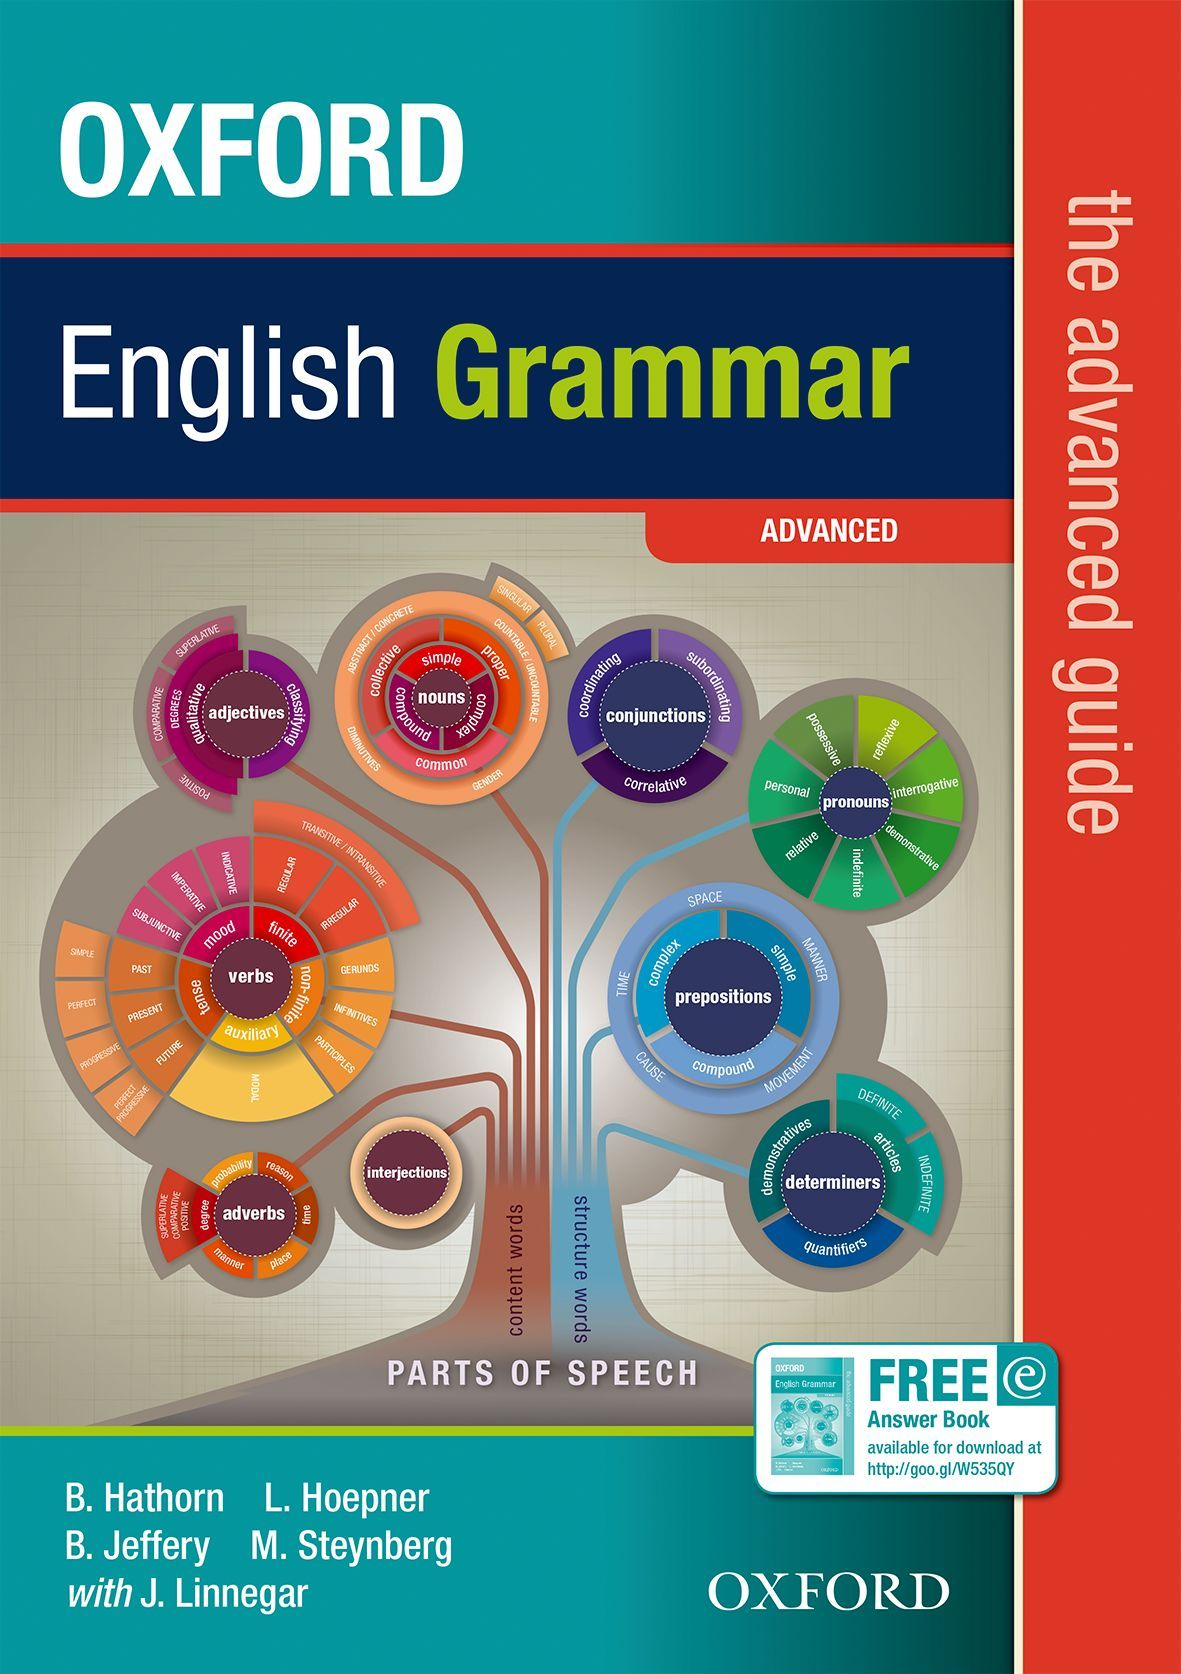 Oxford University Press Oxford English Grammar The